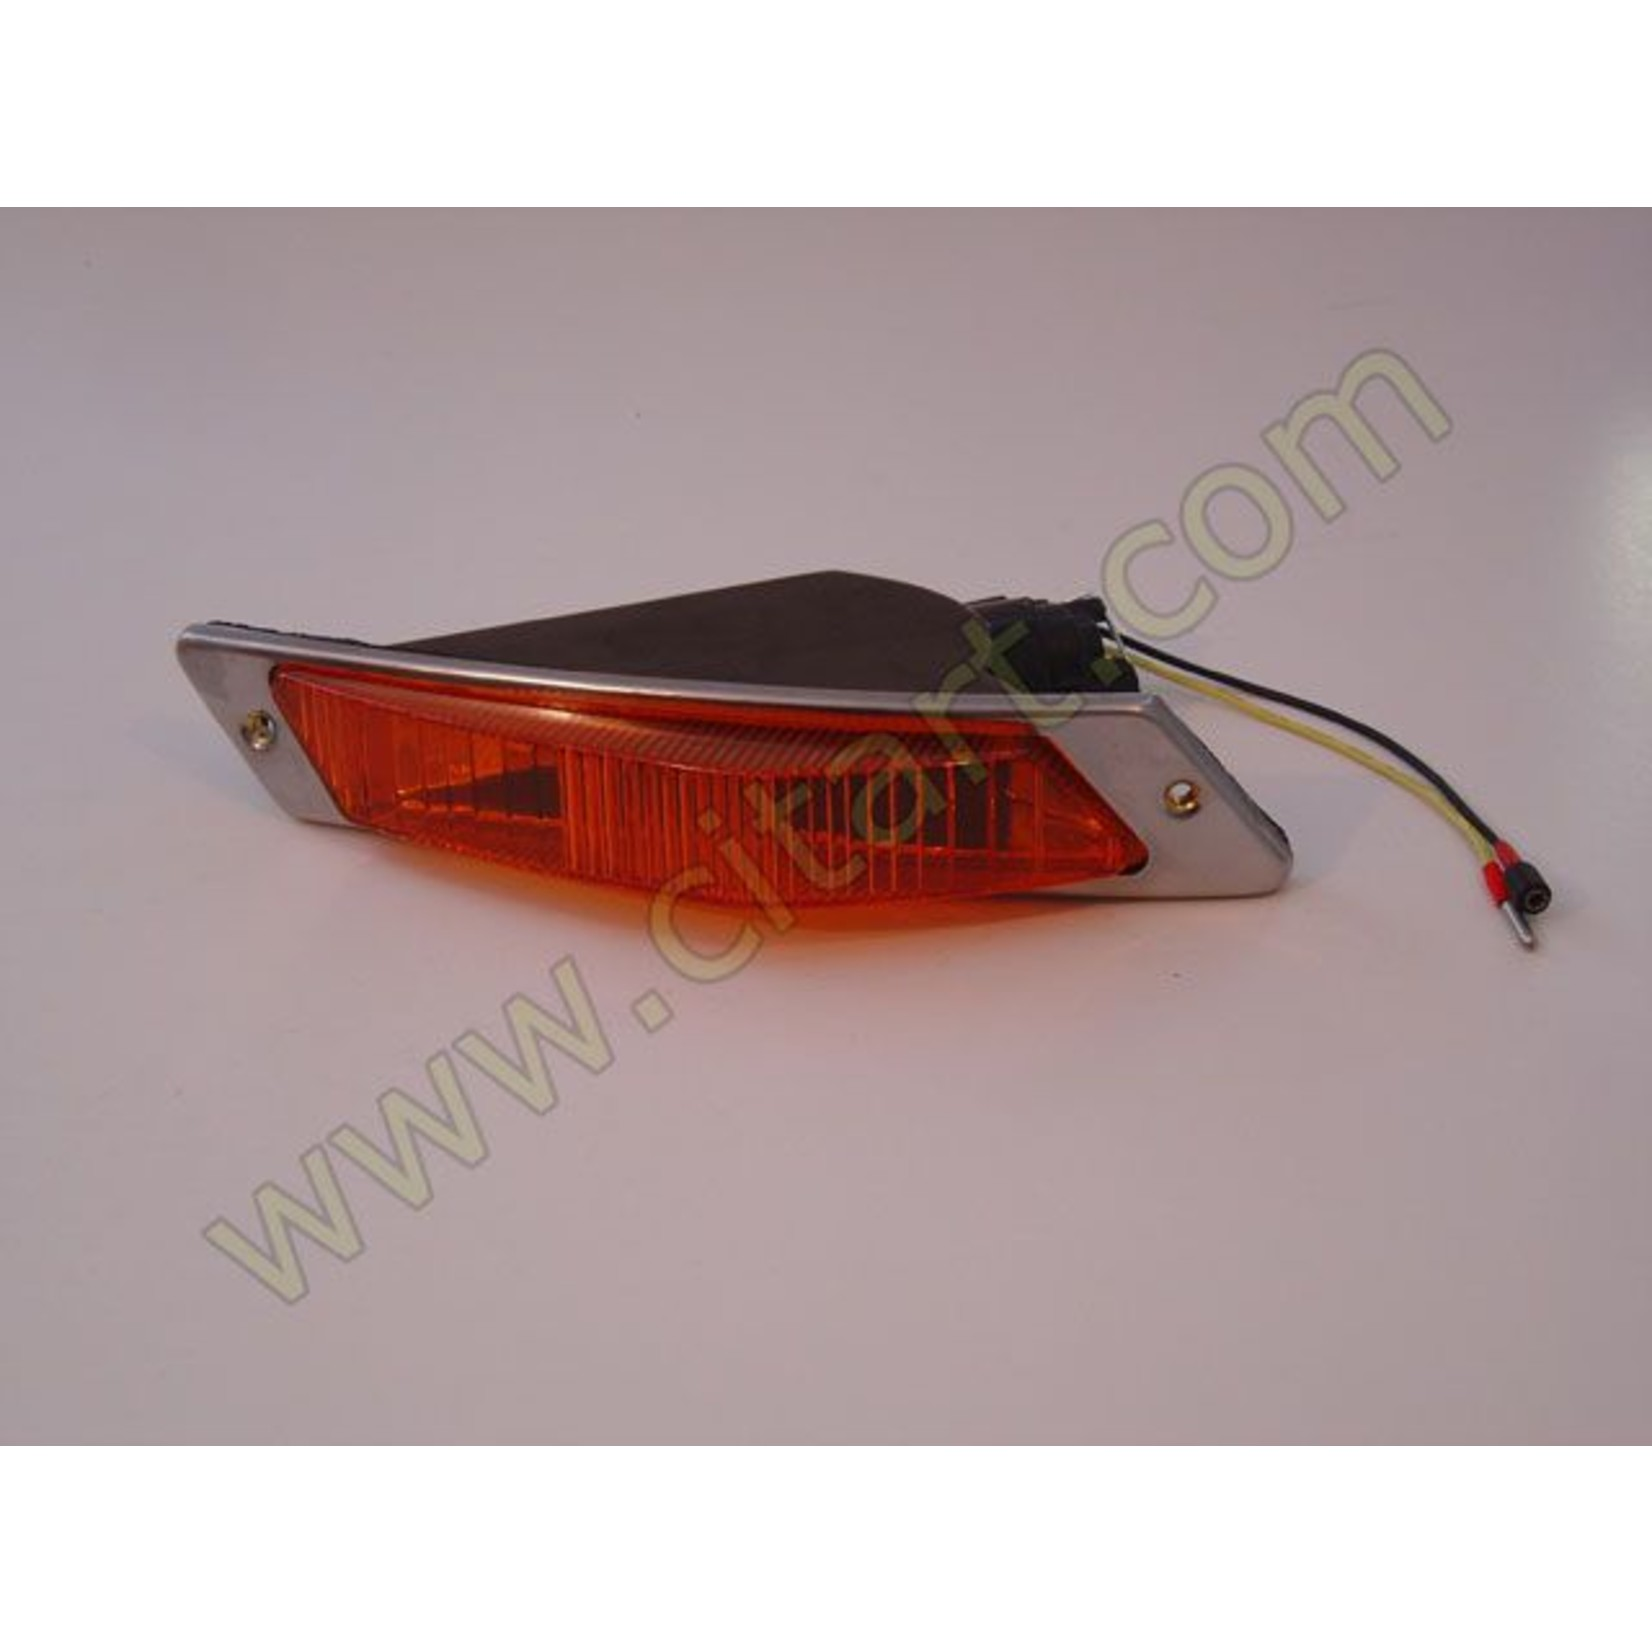 Richtingaanwijzer oranje links pallas 68- Nr Org: DX575010V